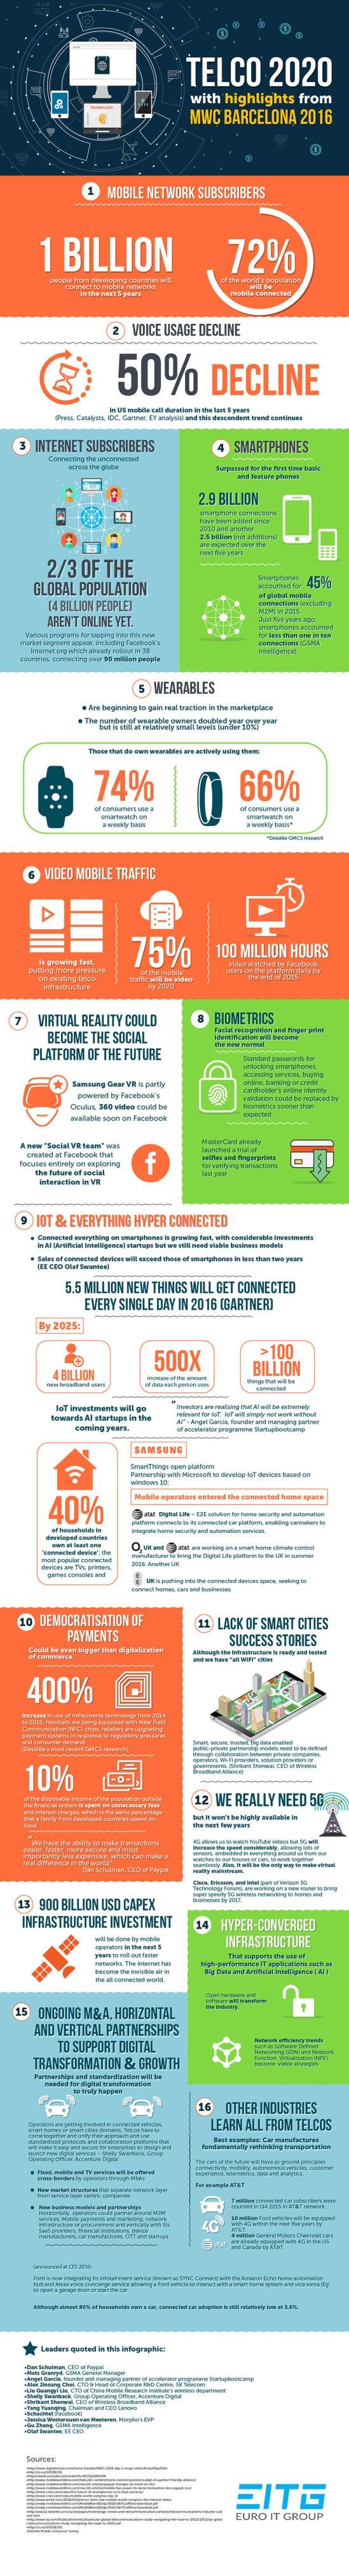 Telecom-2020-Infographic-Telco-Euro-IT-Group1